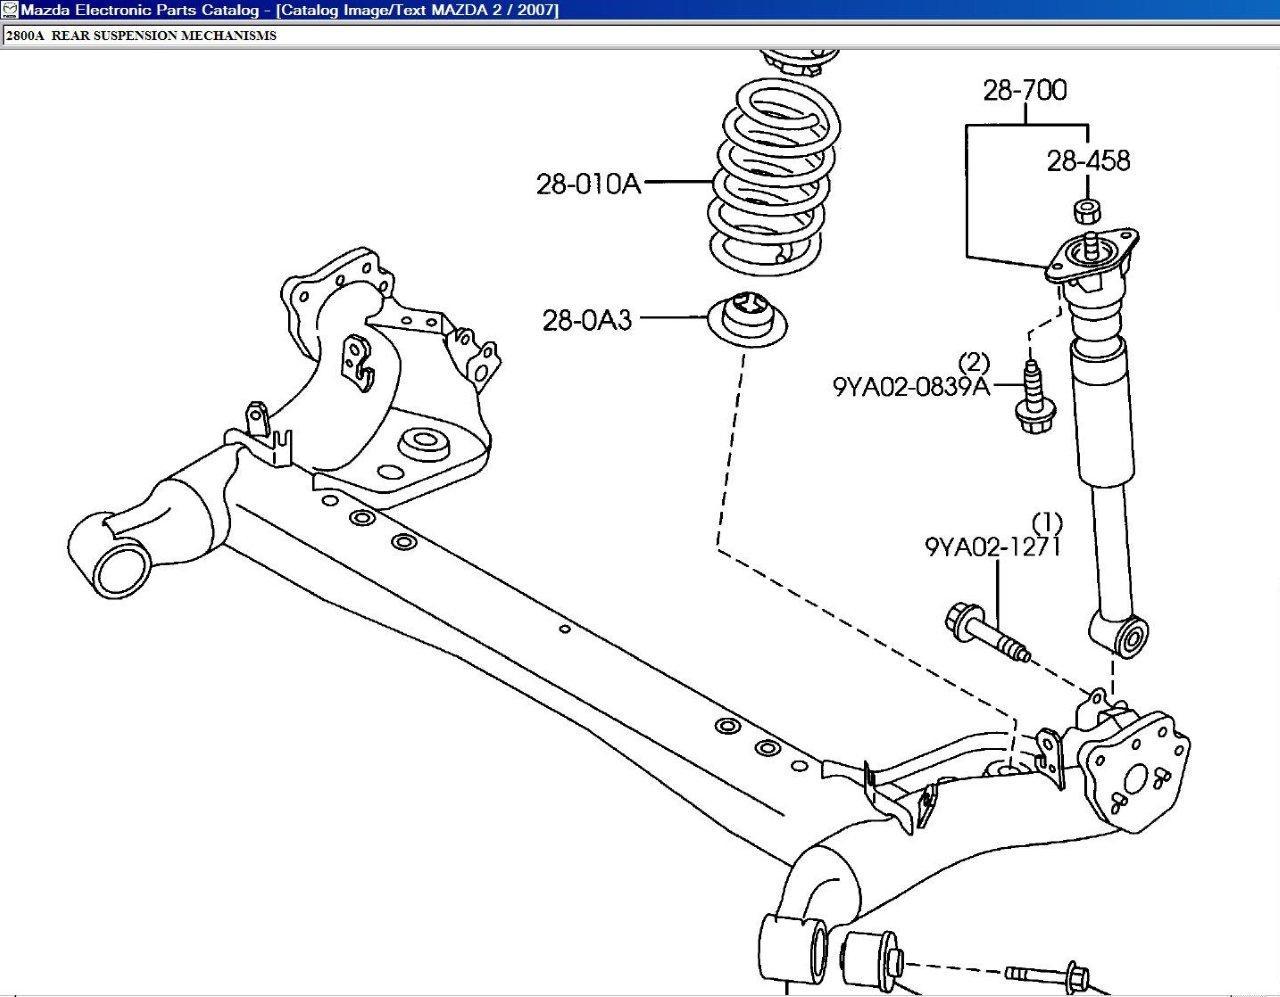 2010 mazda 3 parts diagram rockford fosgate capacitor wiring rear suspension imageresizertool com